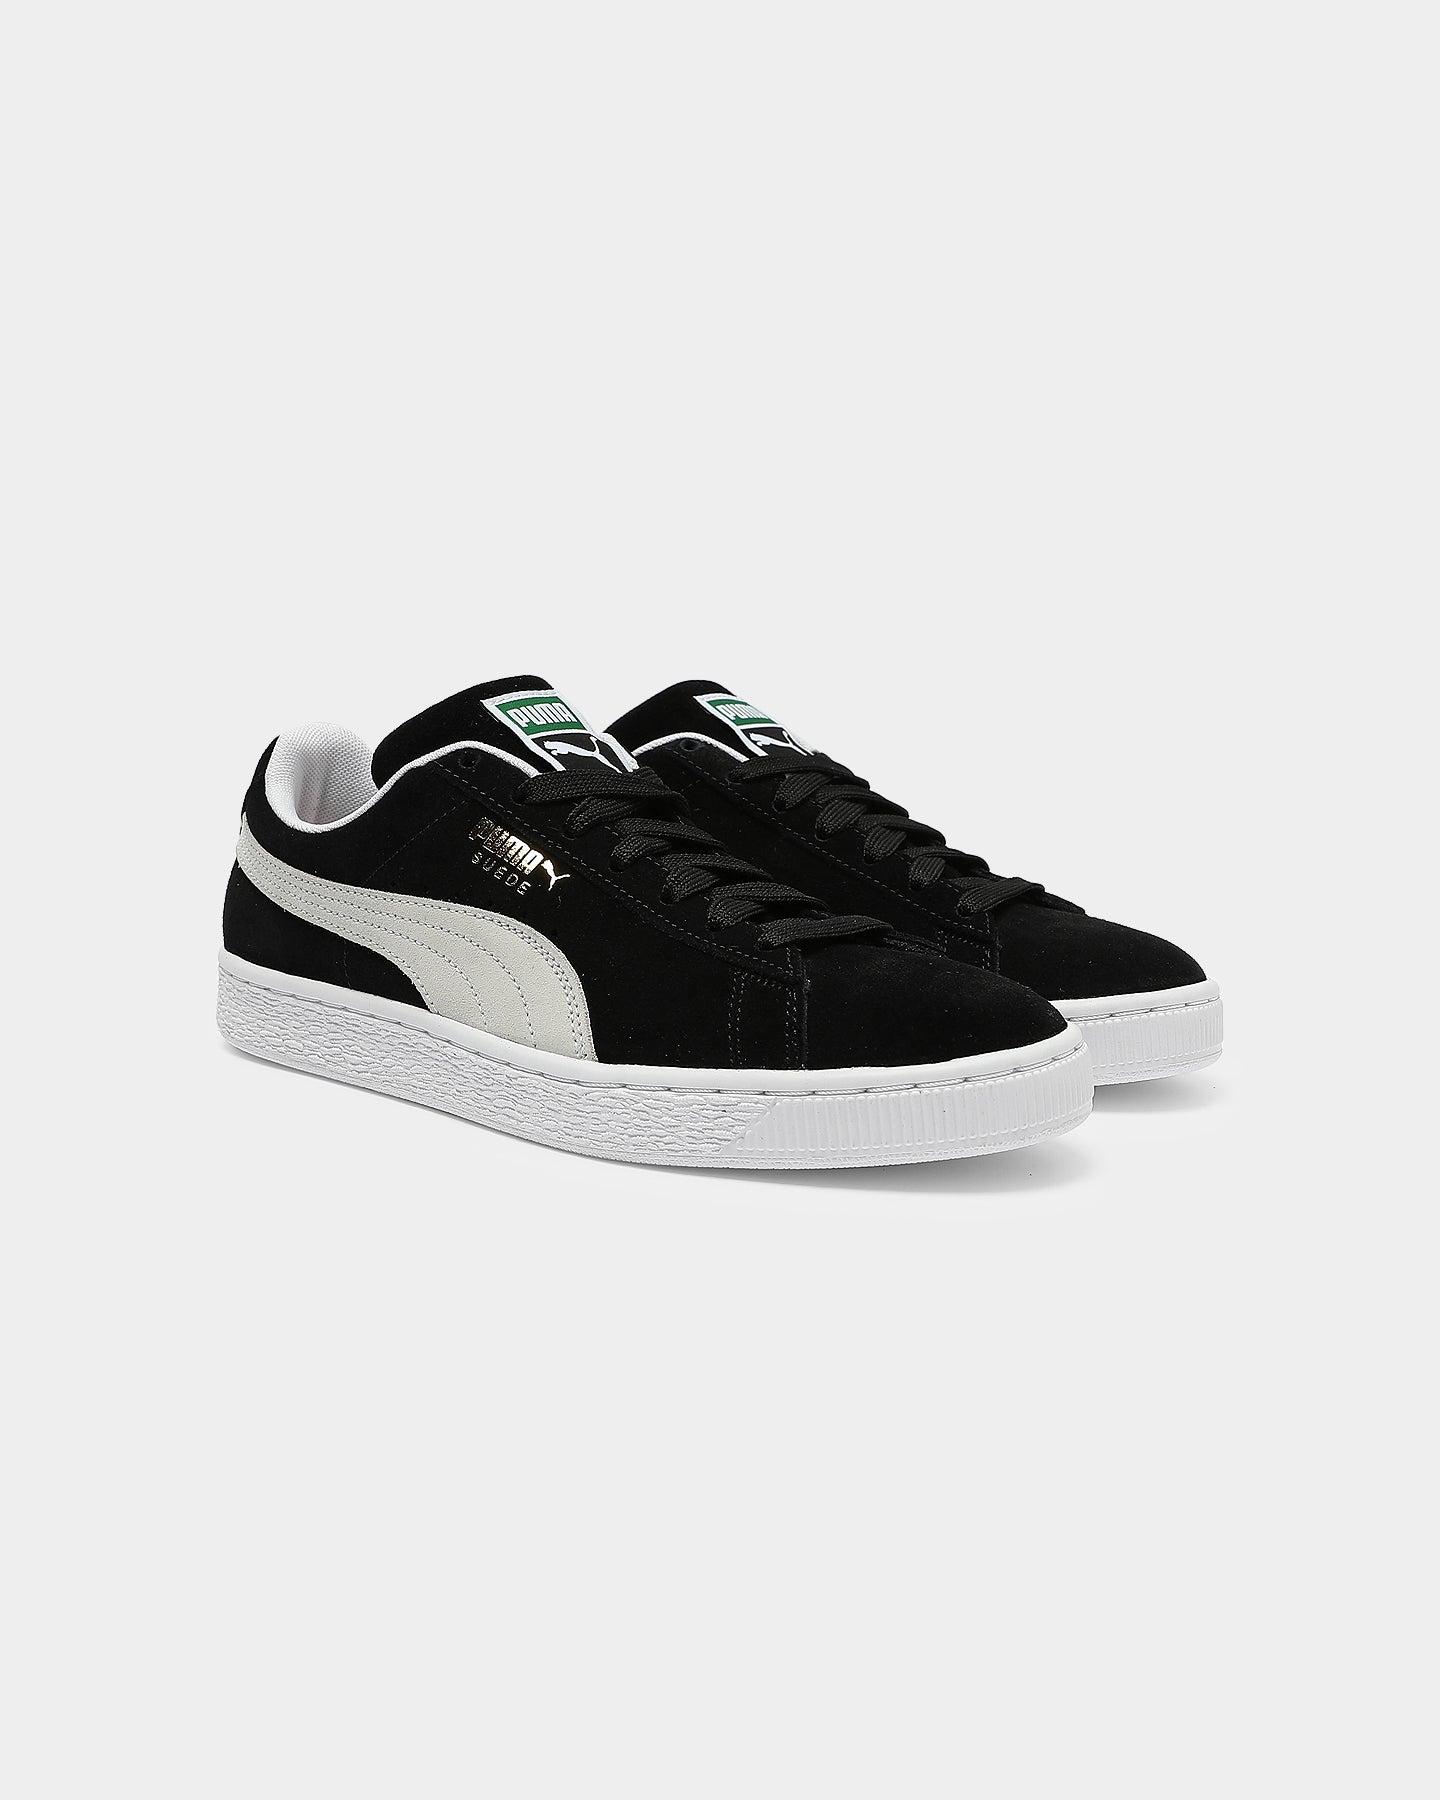 Puma Suede Classic + Black/White